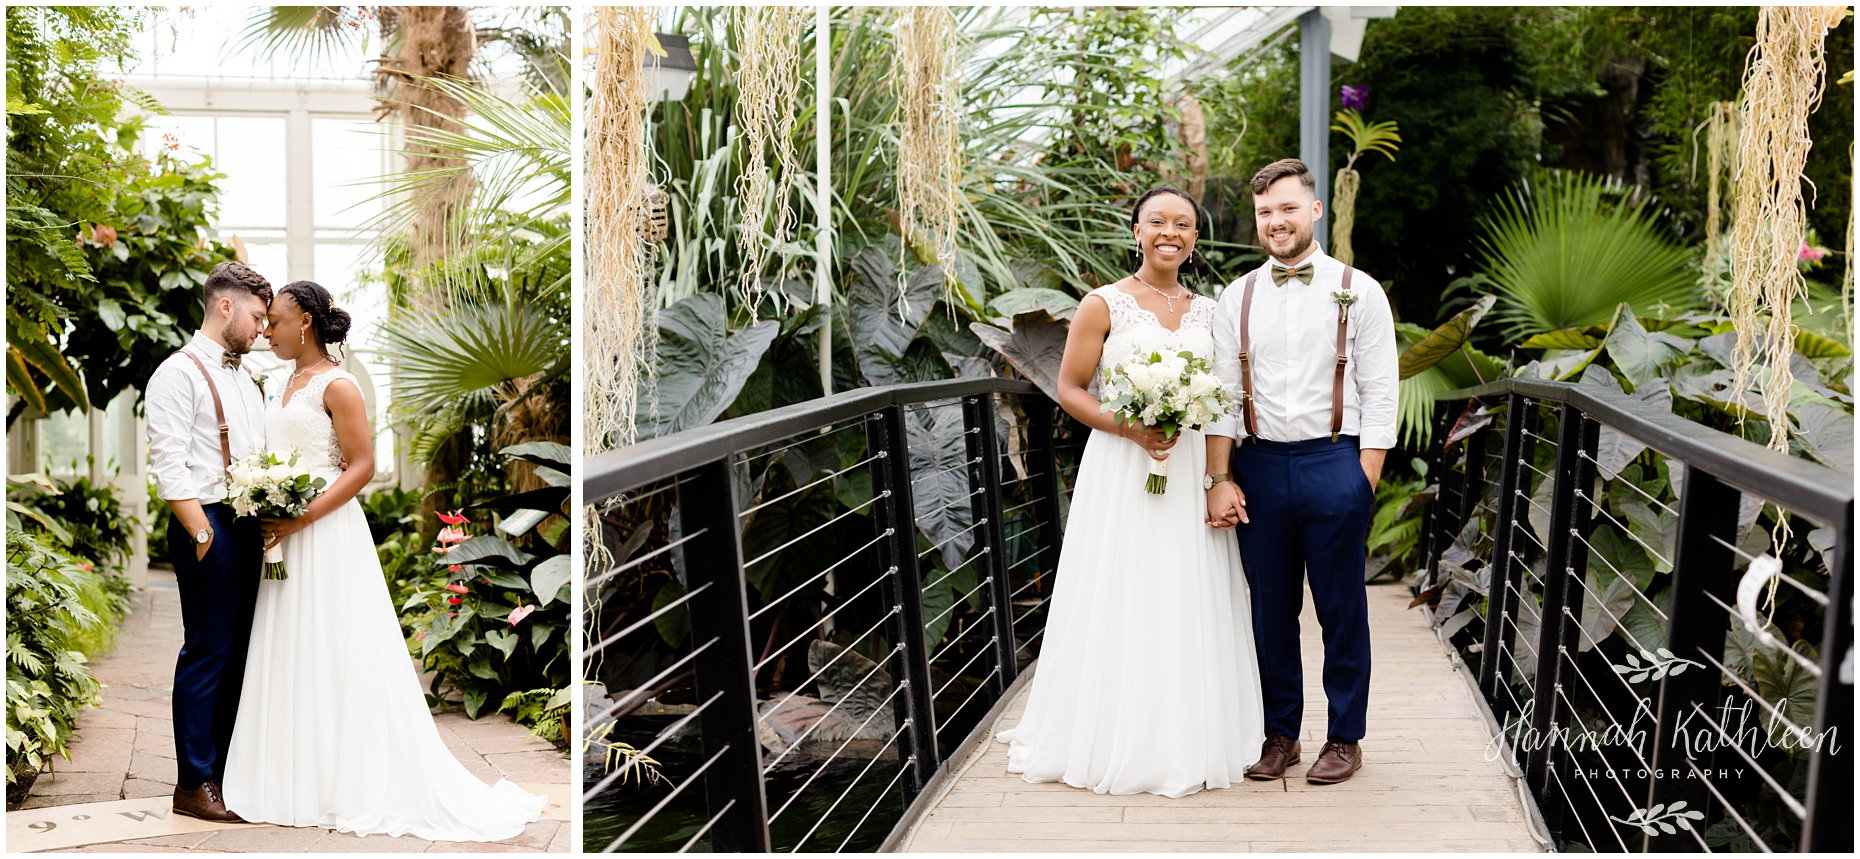 elopement-small-wedding-intimate-avanti-mansion-buffalo-botanical-gardens-photographer-portraits